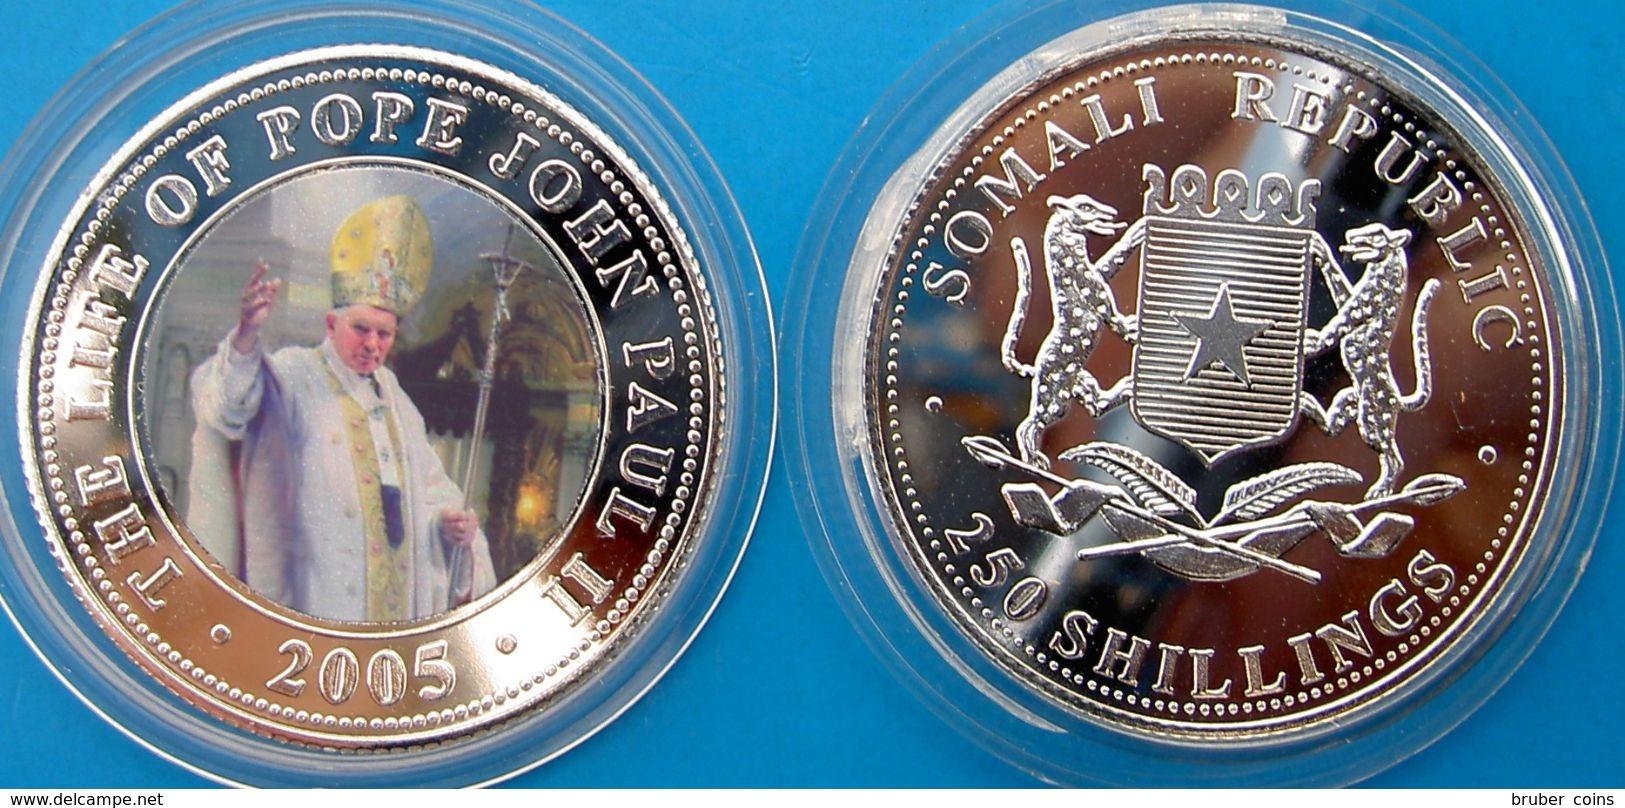 SOMALI REPUBLIC 250 SHILLINGS 2005 THE LIFE OF POPE JOHN PAUL II (9) - Somalia